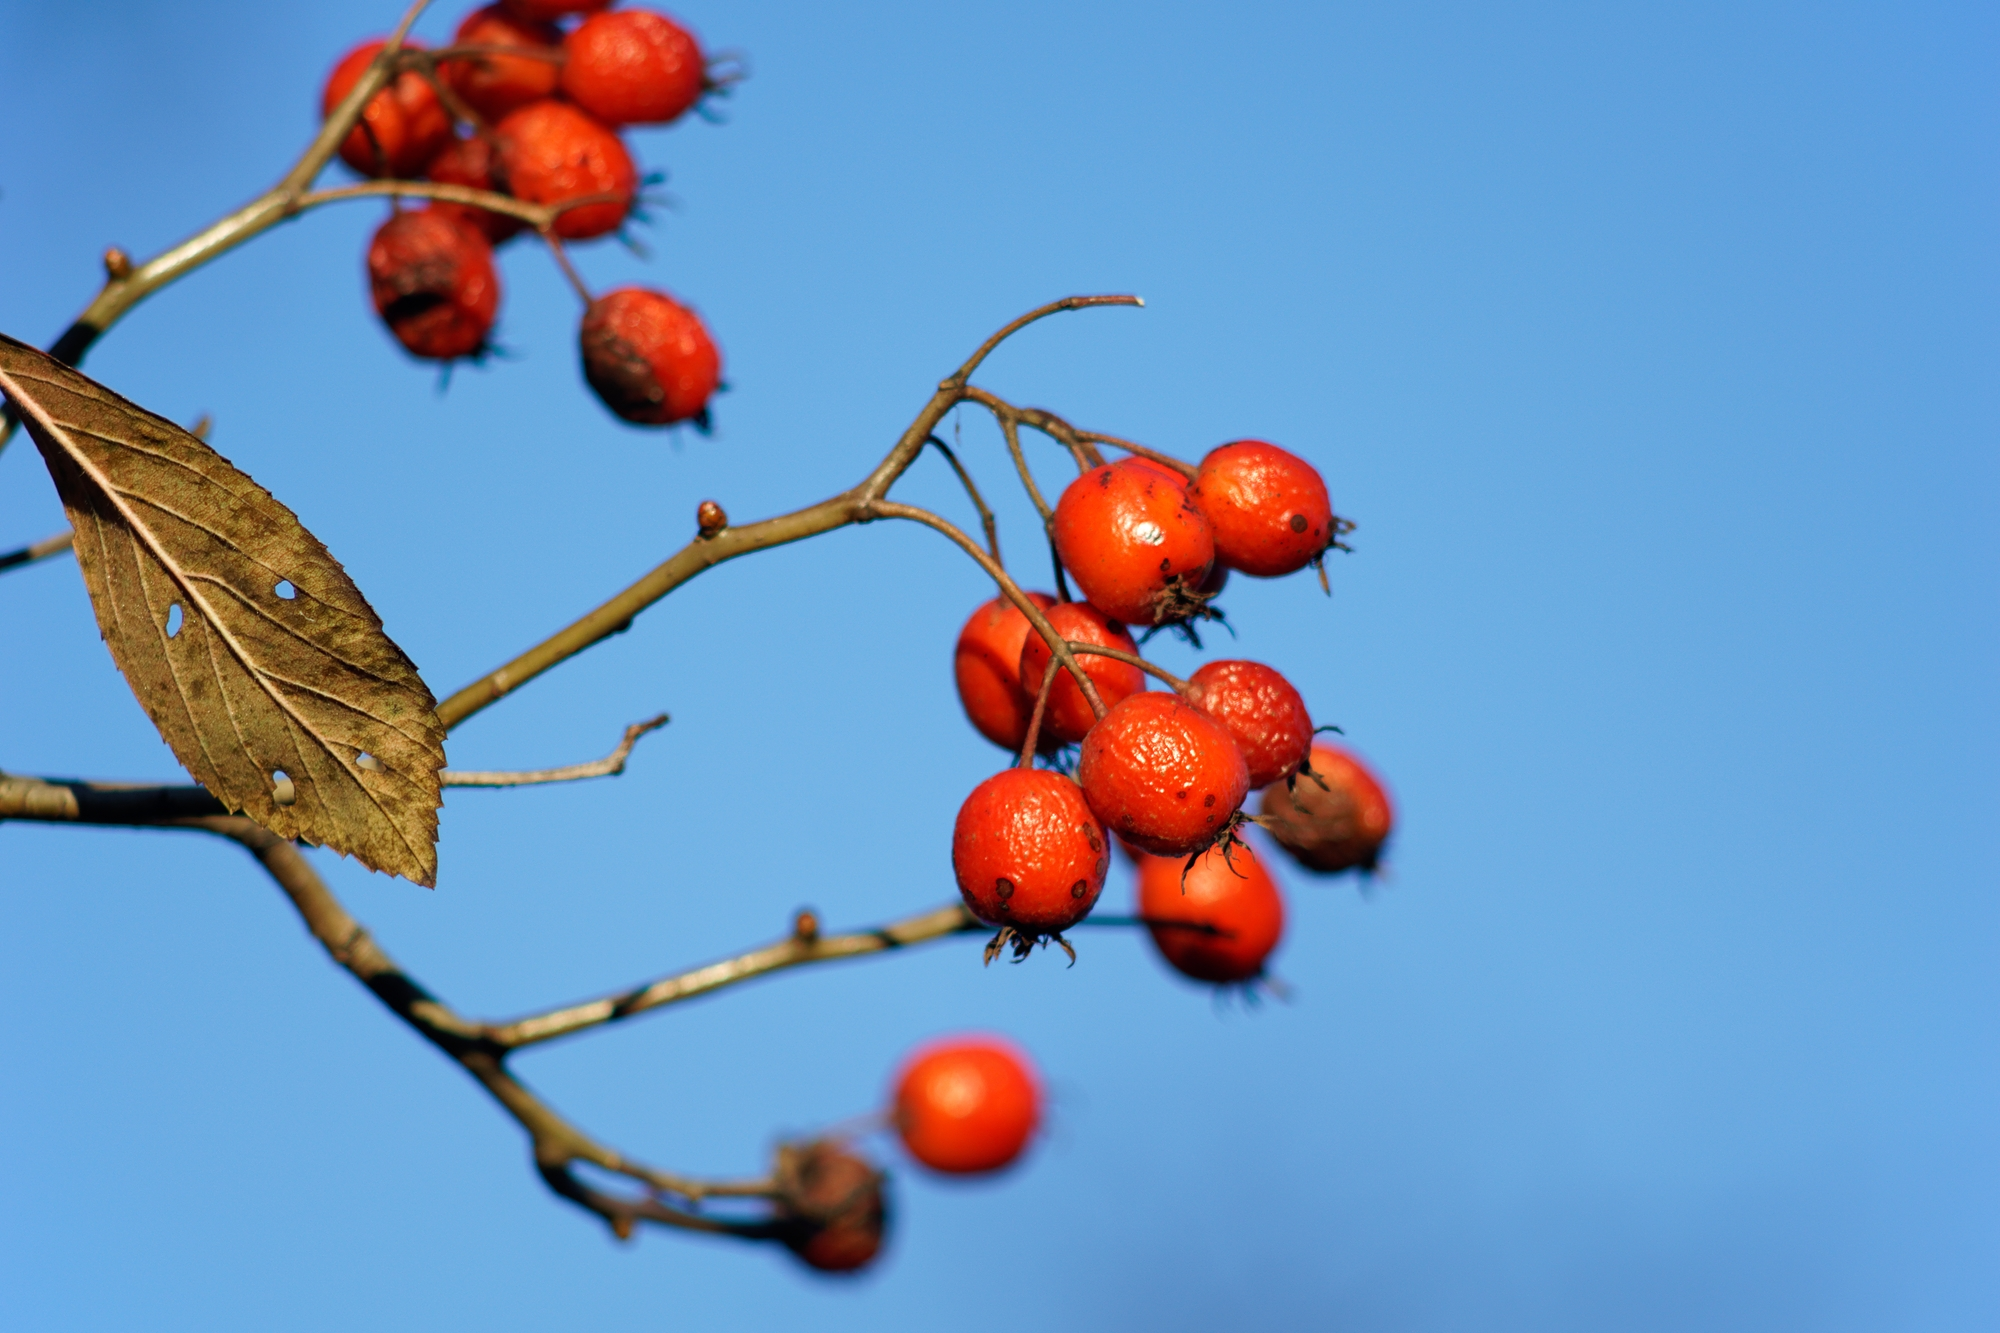 Elysium - photography, berry, tele - marcushammerschmitt | ello